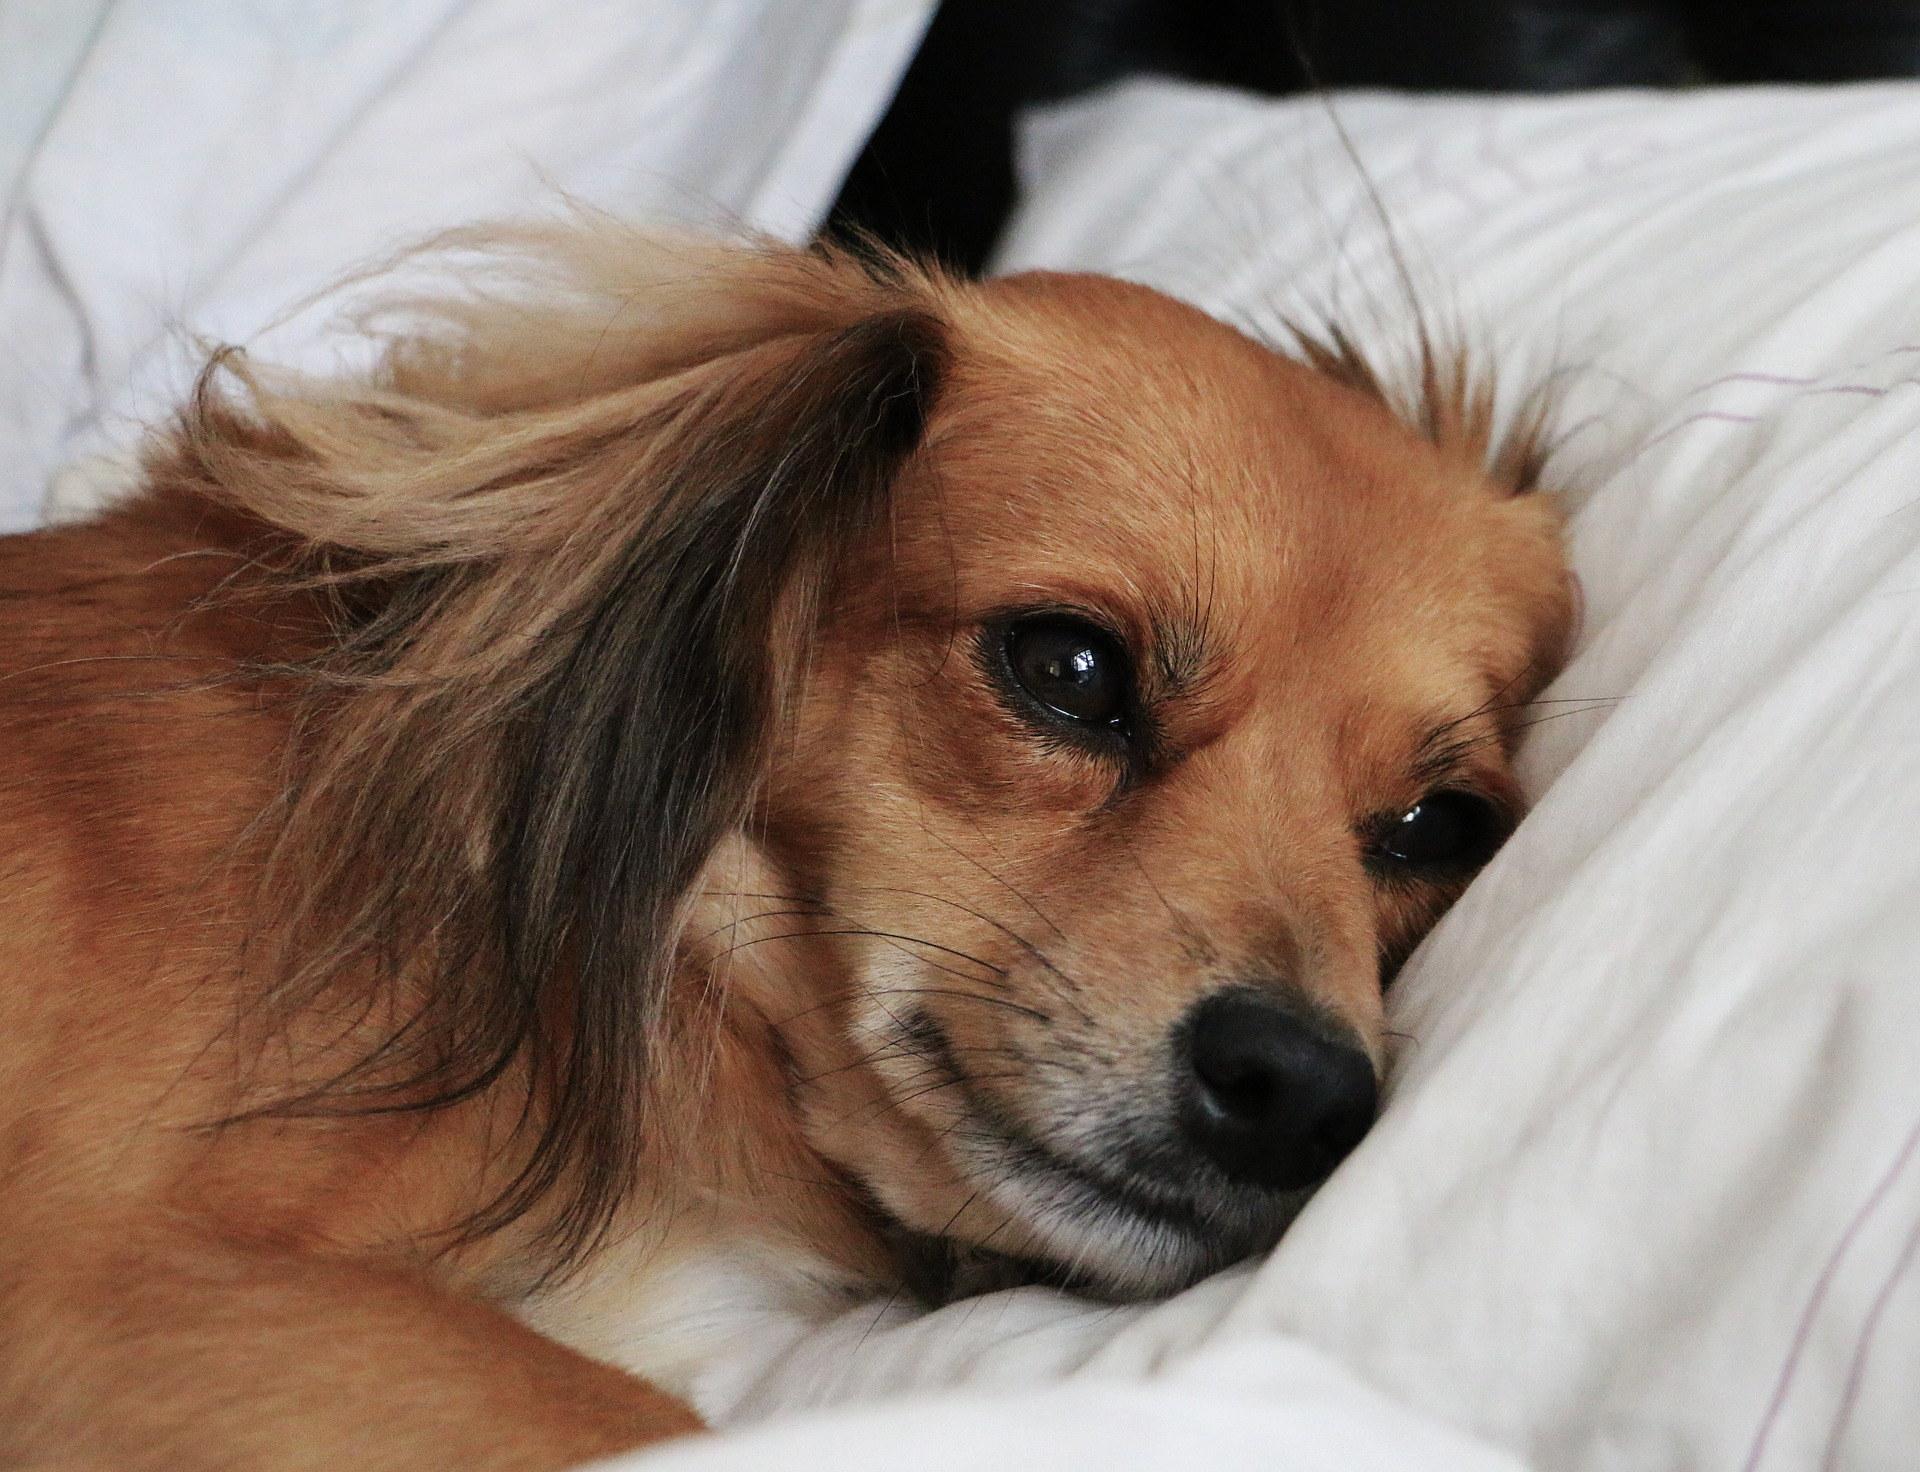 der hunde ratgeber darf der hund im bett schlafen schwerin lokal. Black Bedroom Furniture Sets. Home Design Ideas